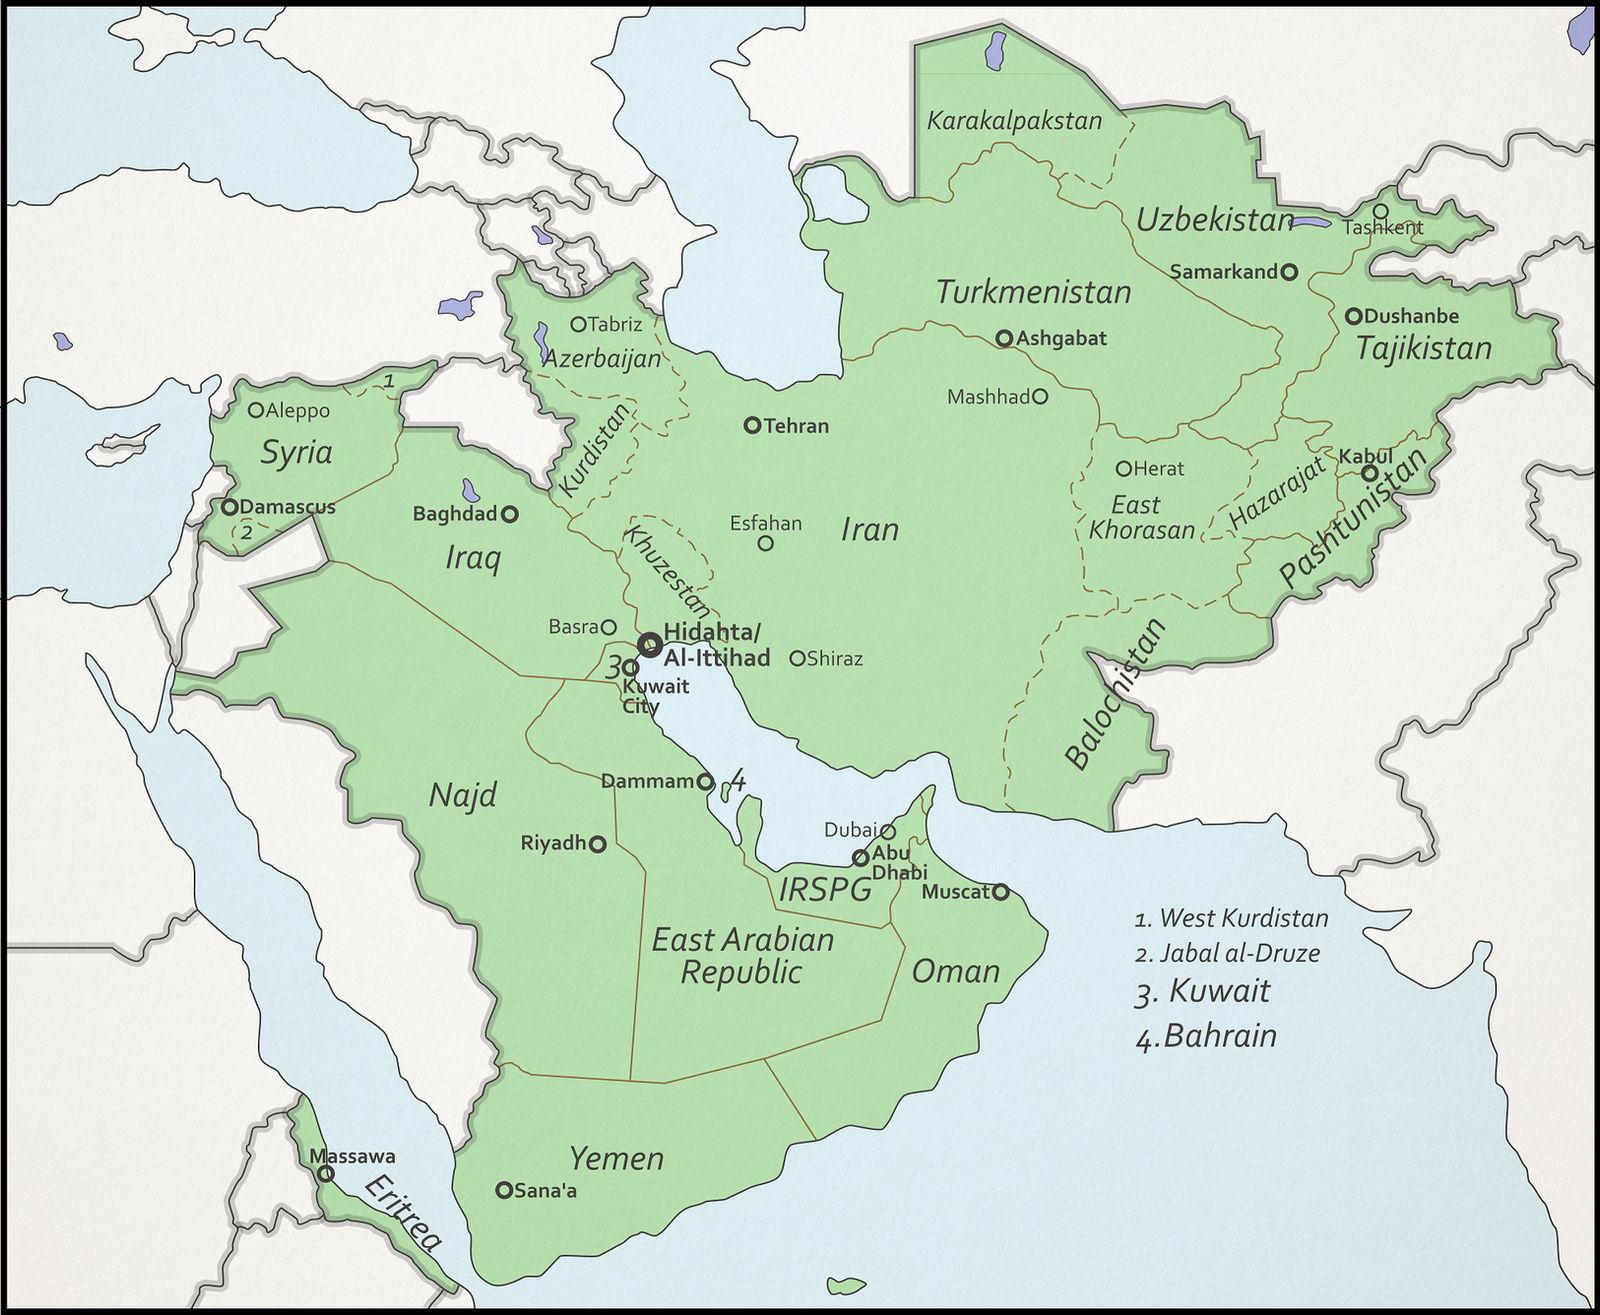 Union of Islamic Republics